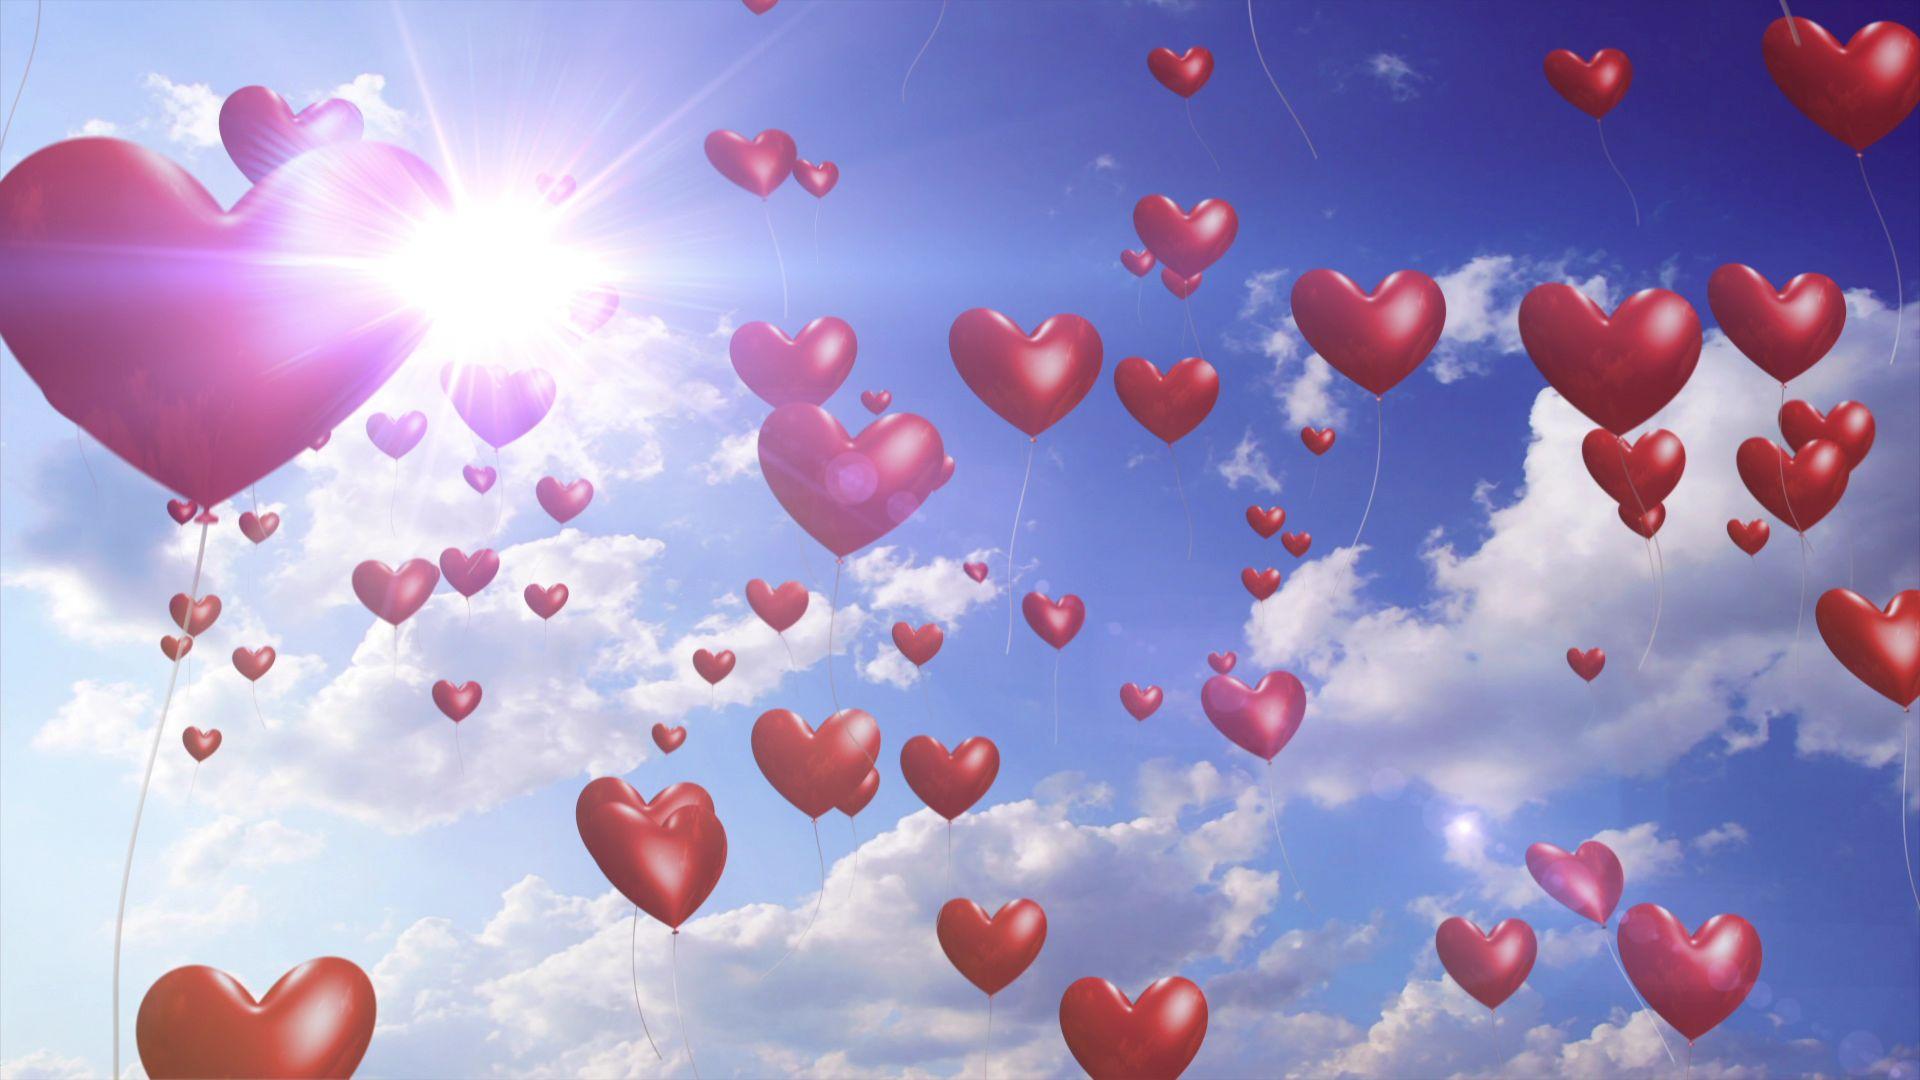 desktop wallpaper valentine heart balloons - photo #10